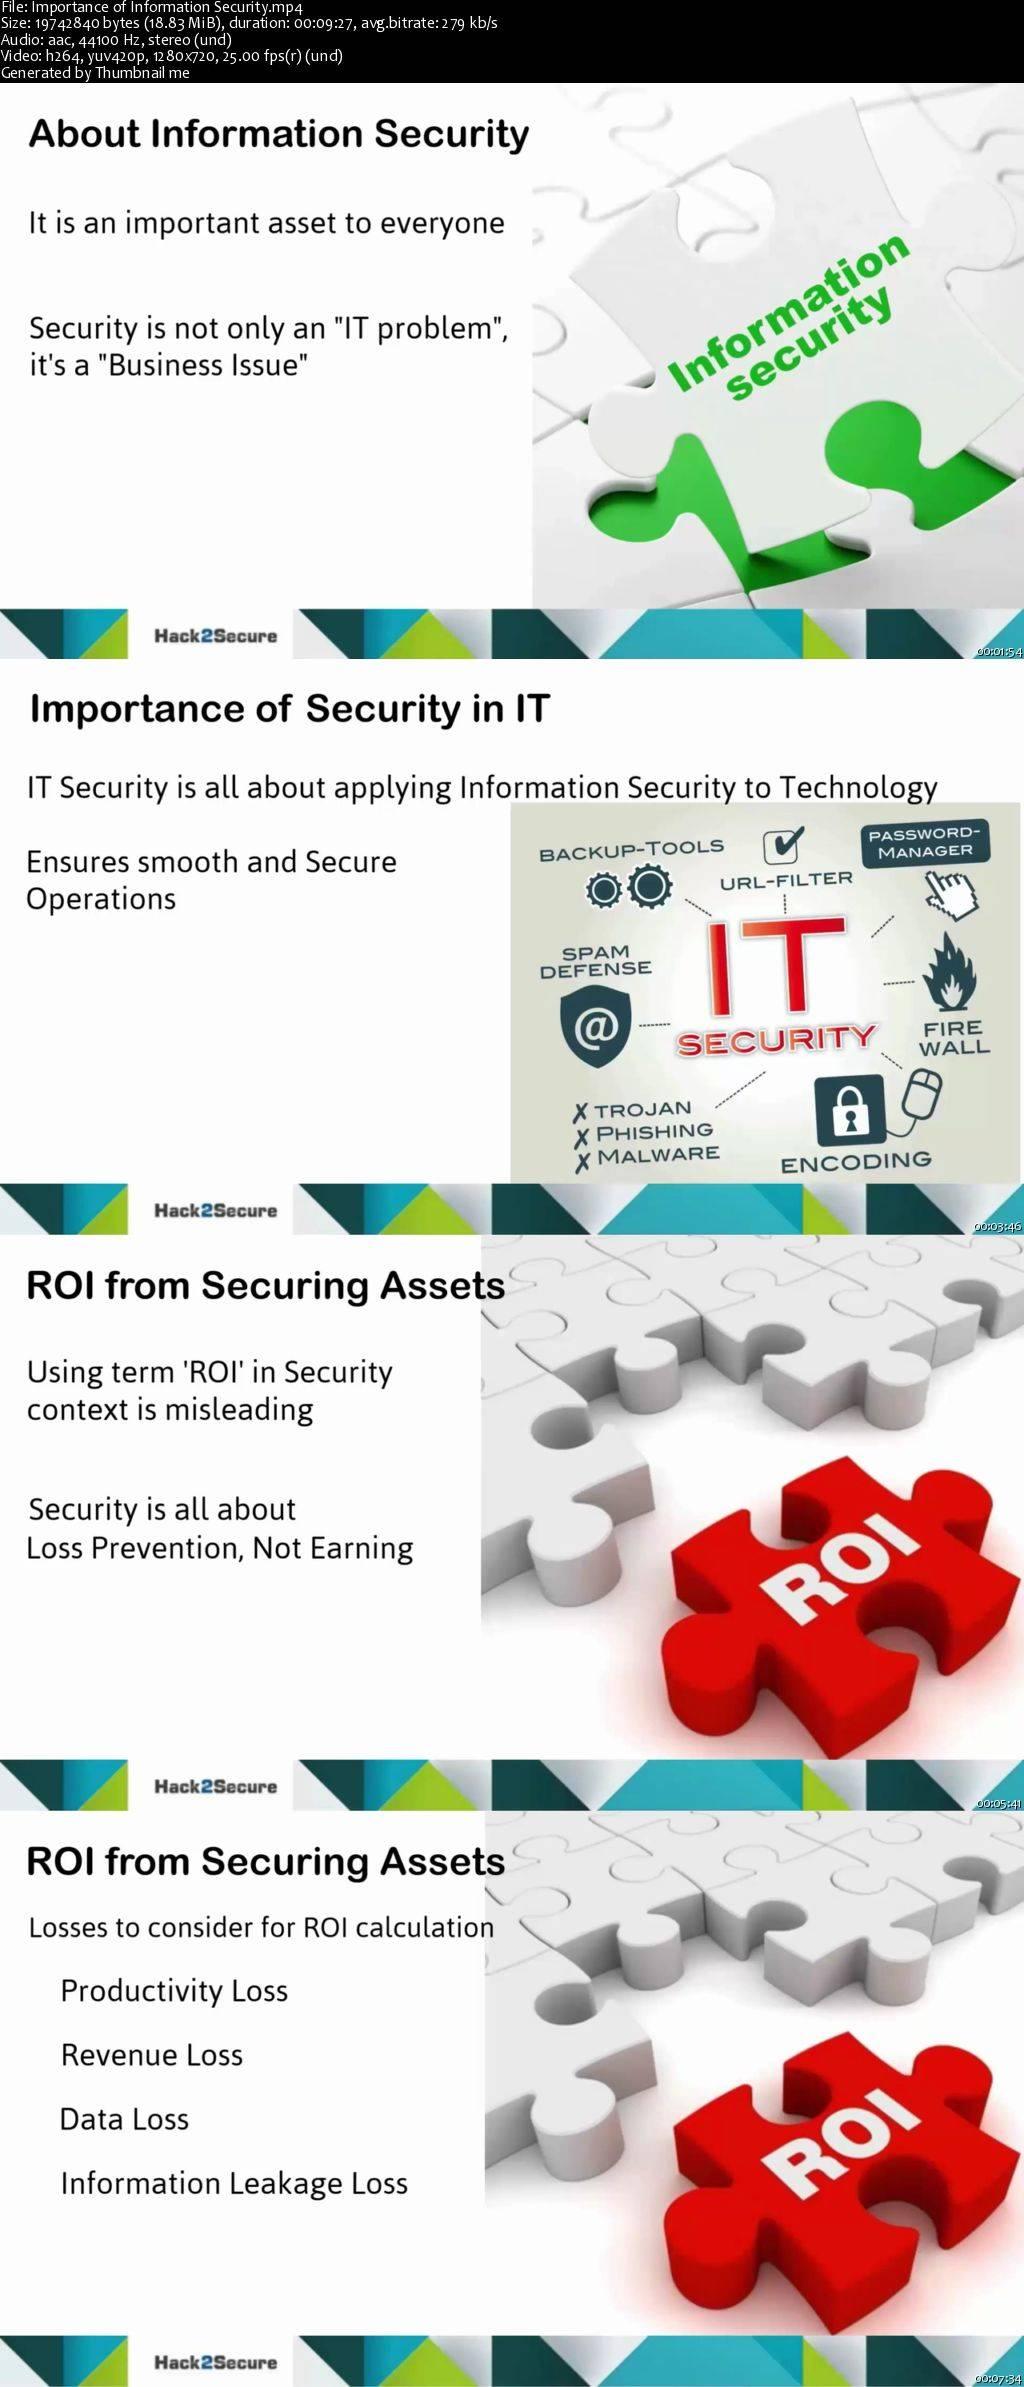 SSL/TLS Protocol and Handshake Process